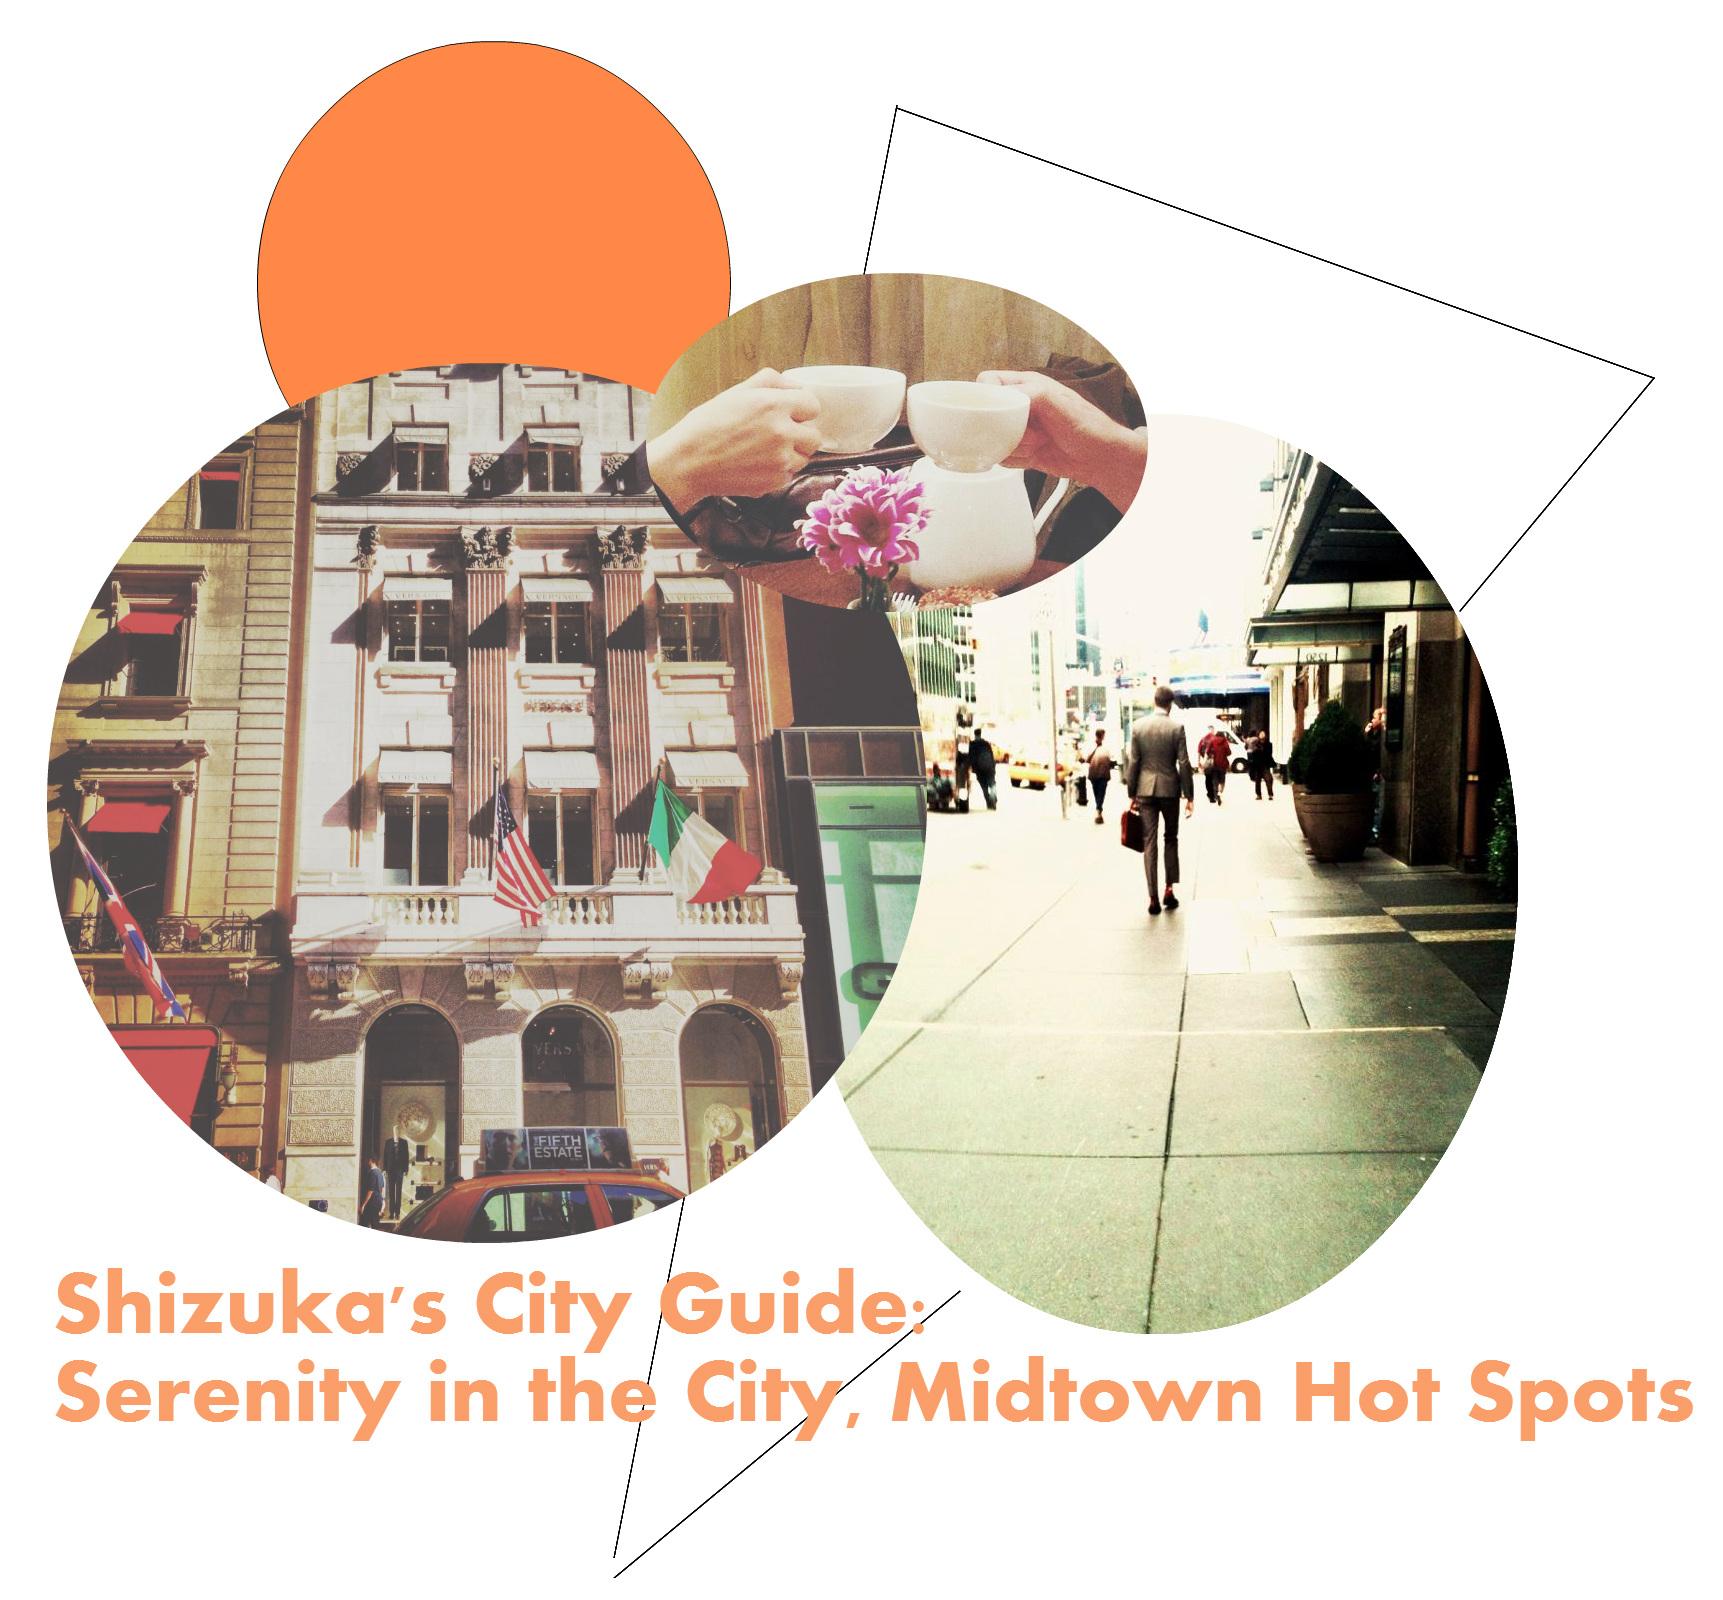 Shizuka's City Guide Serenity in the City Midtown Hot Spots